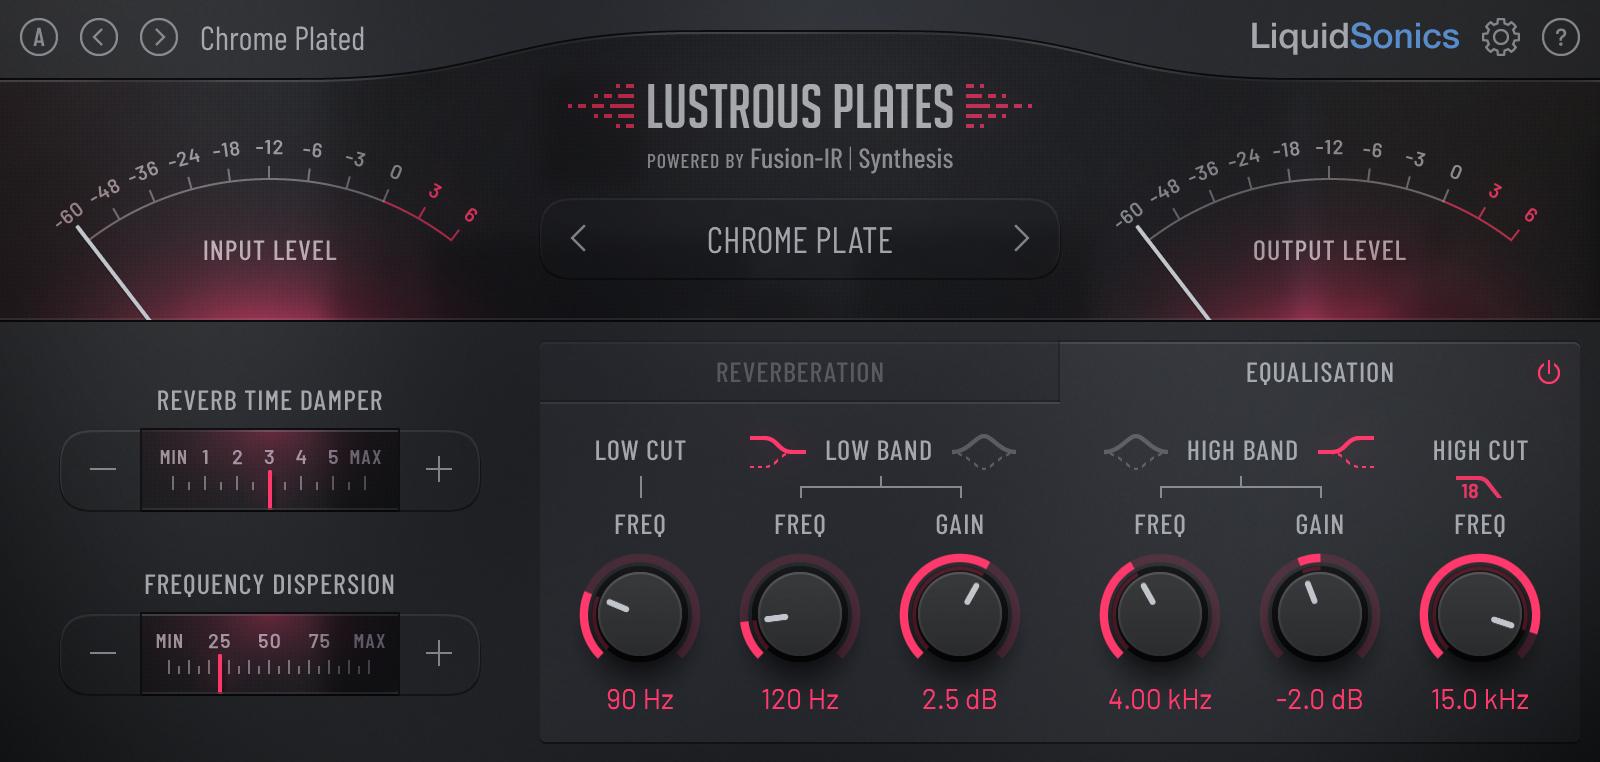 Lustrous Plates - EQ